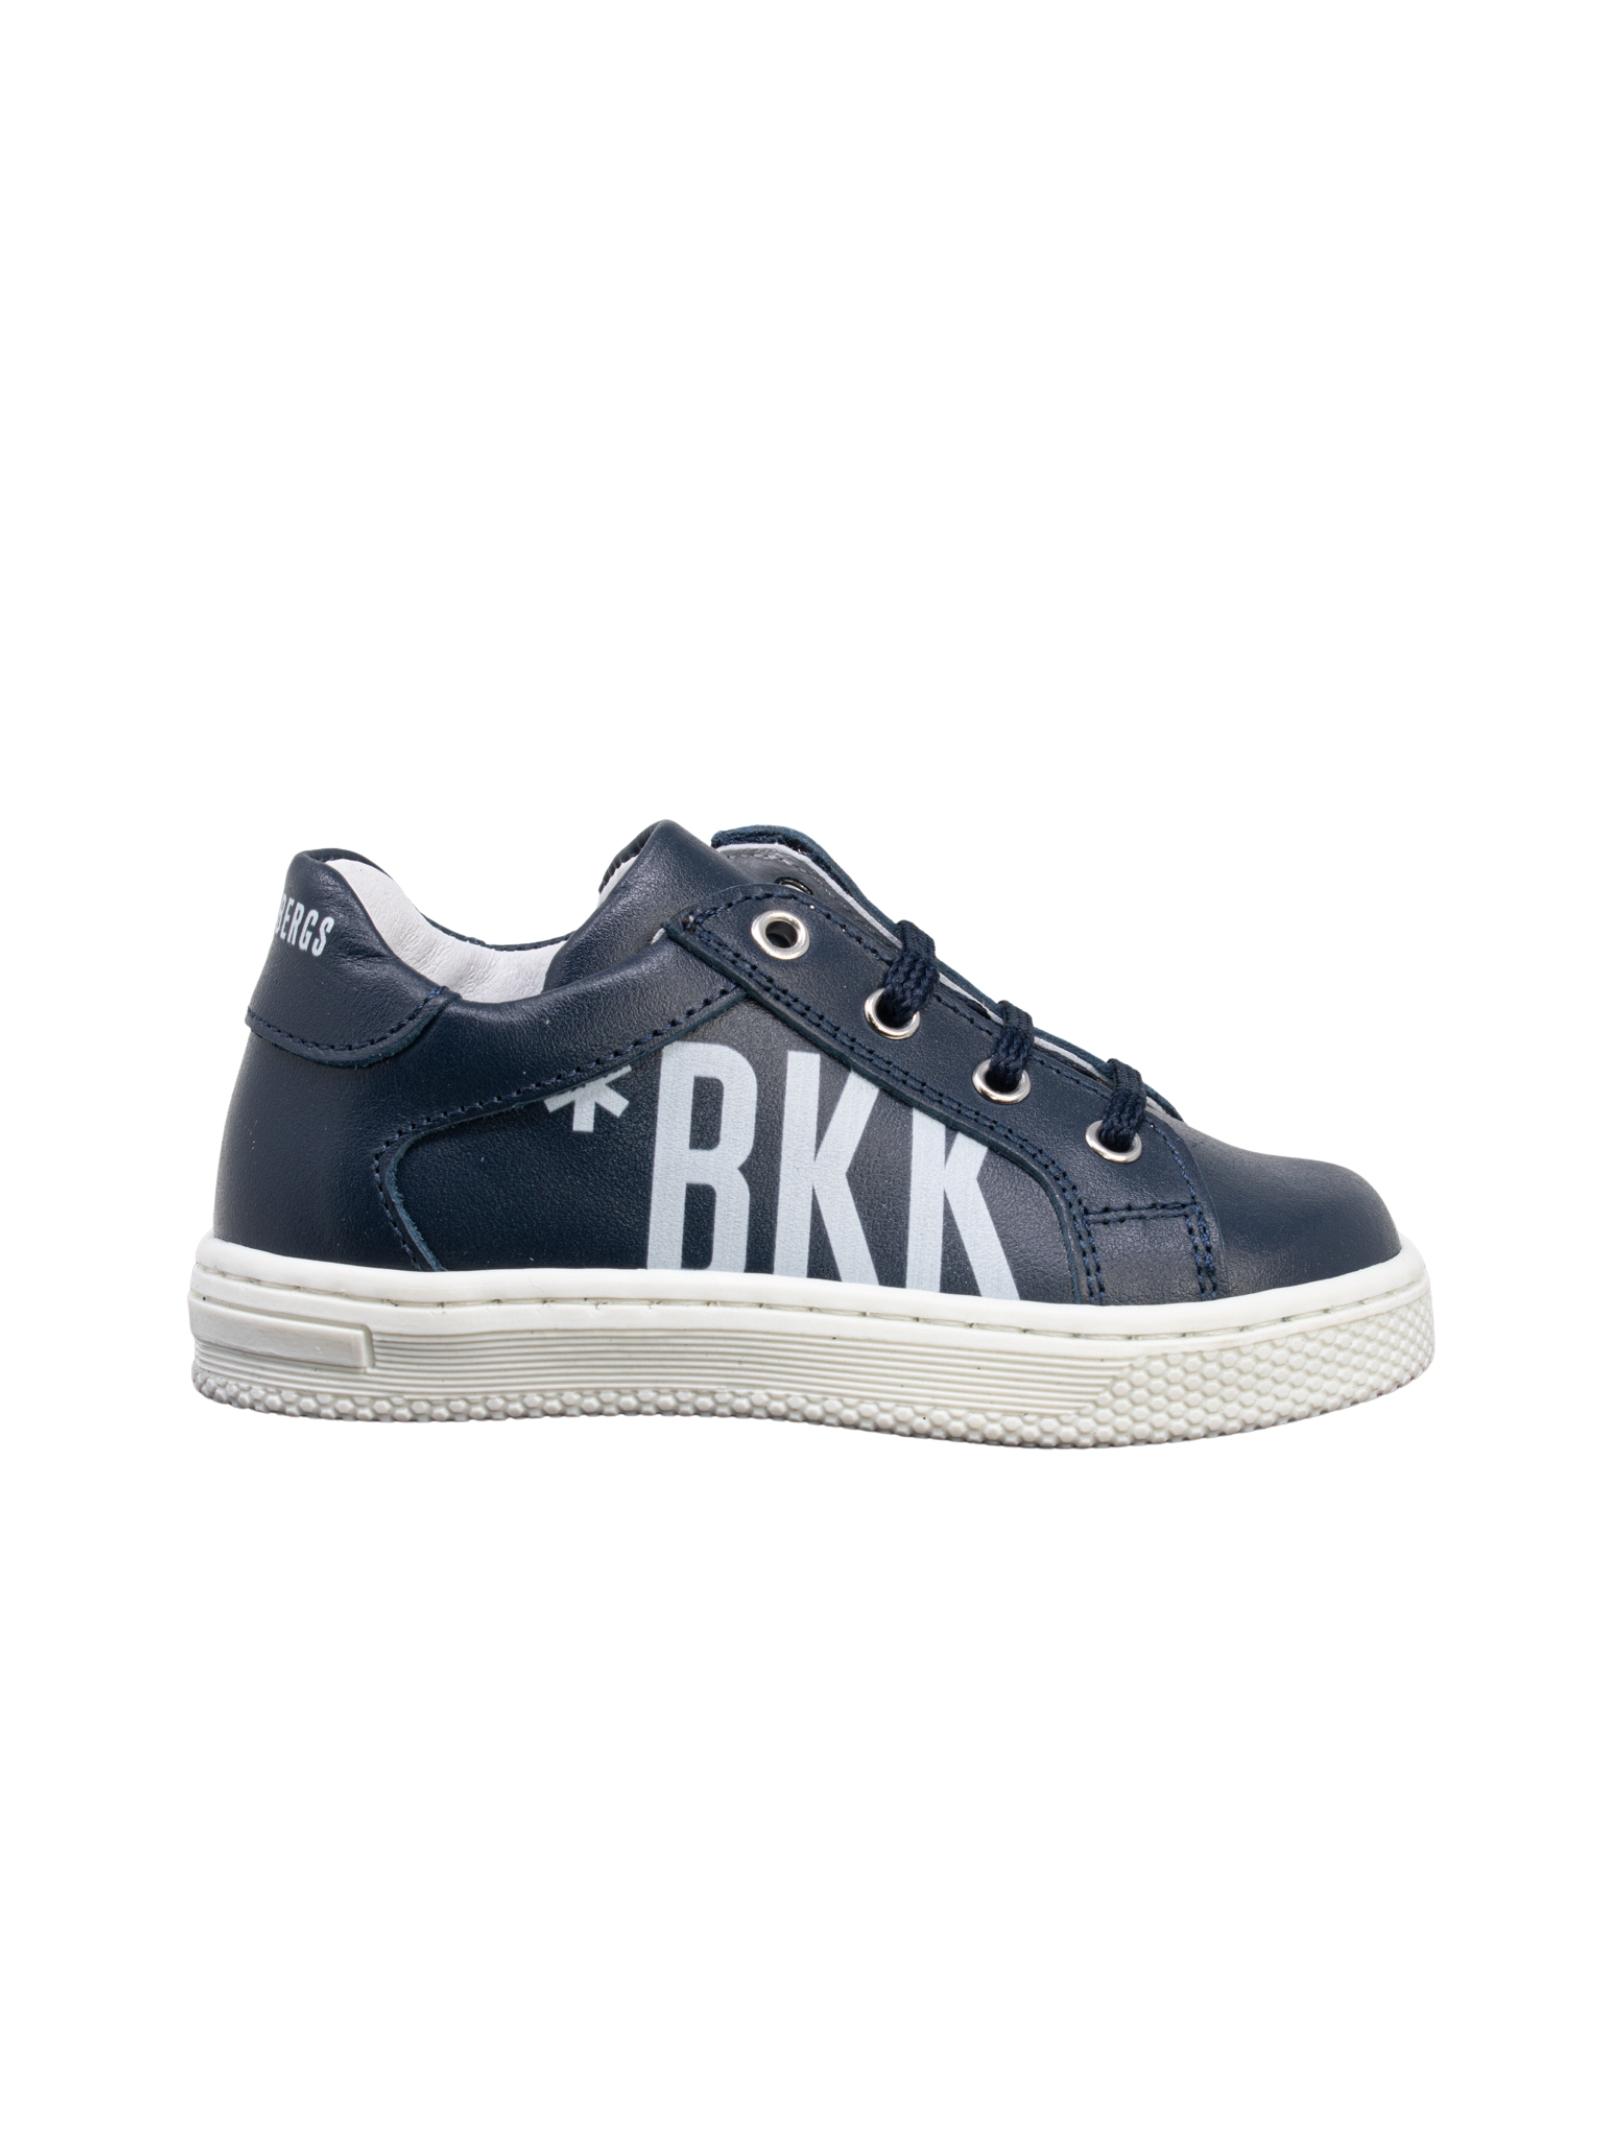 BIKKEMBERGS KIDS   Sneakers   K1B4206700092X007BLU